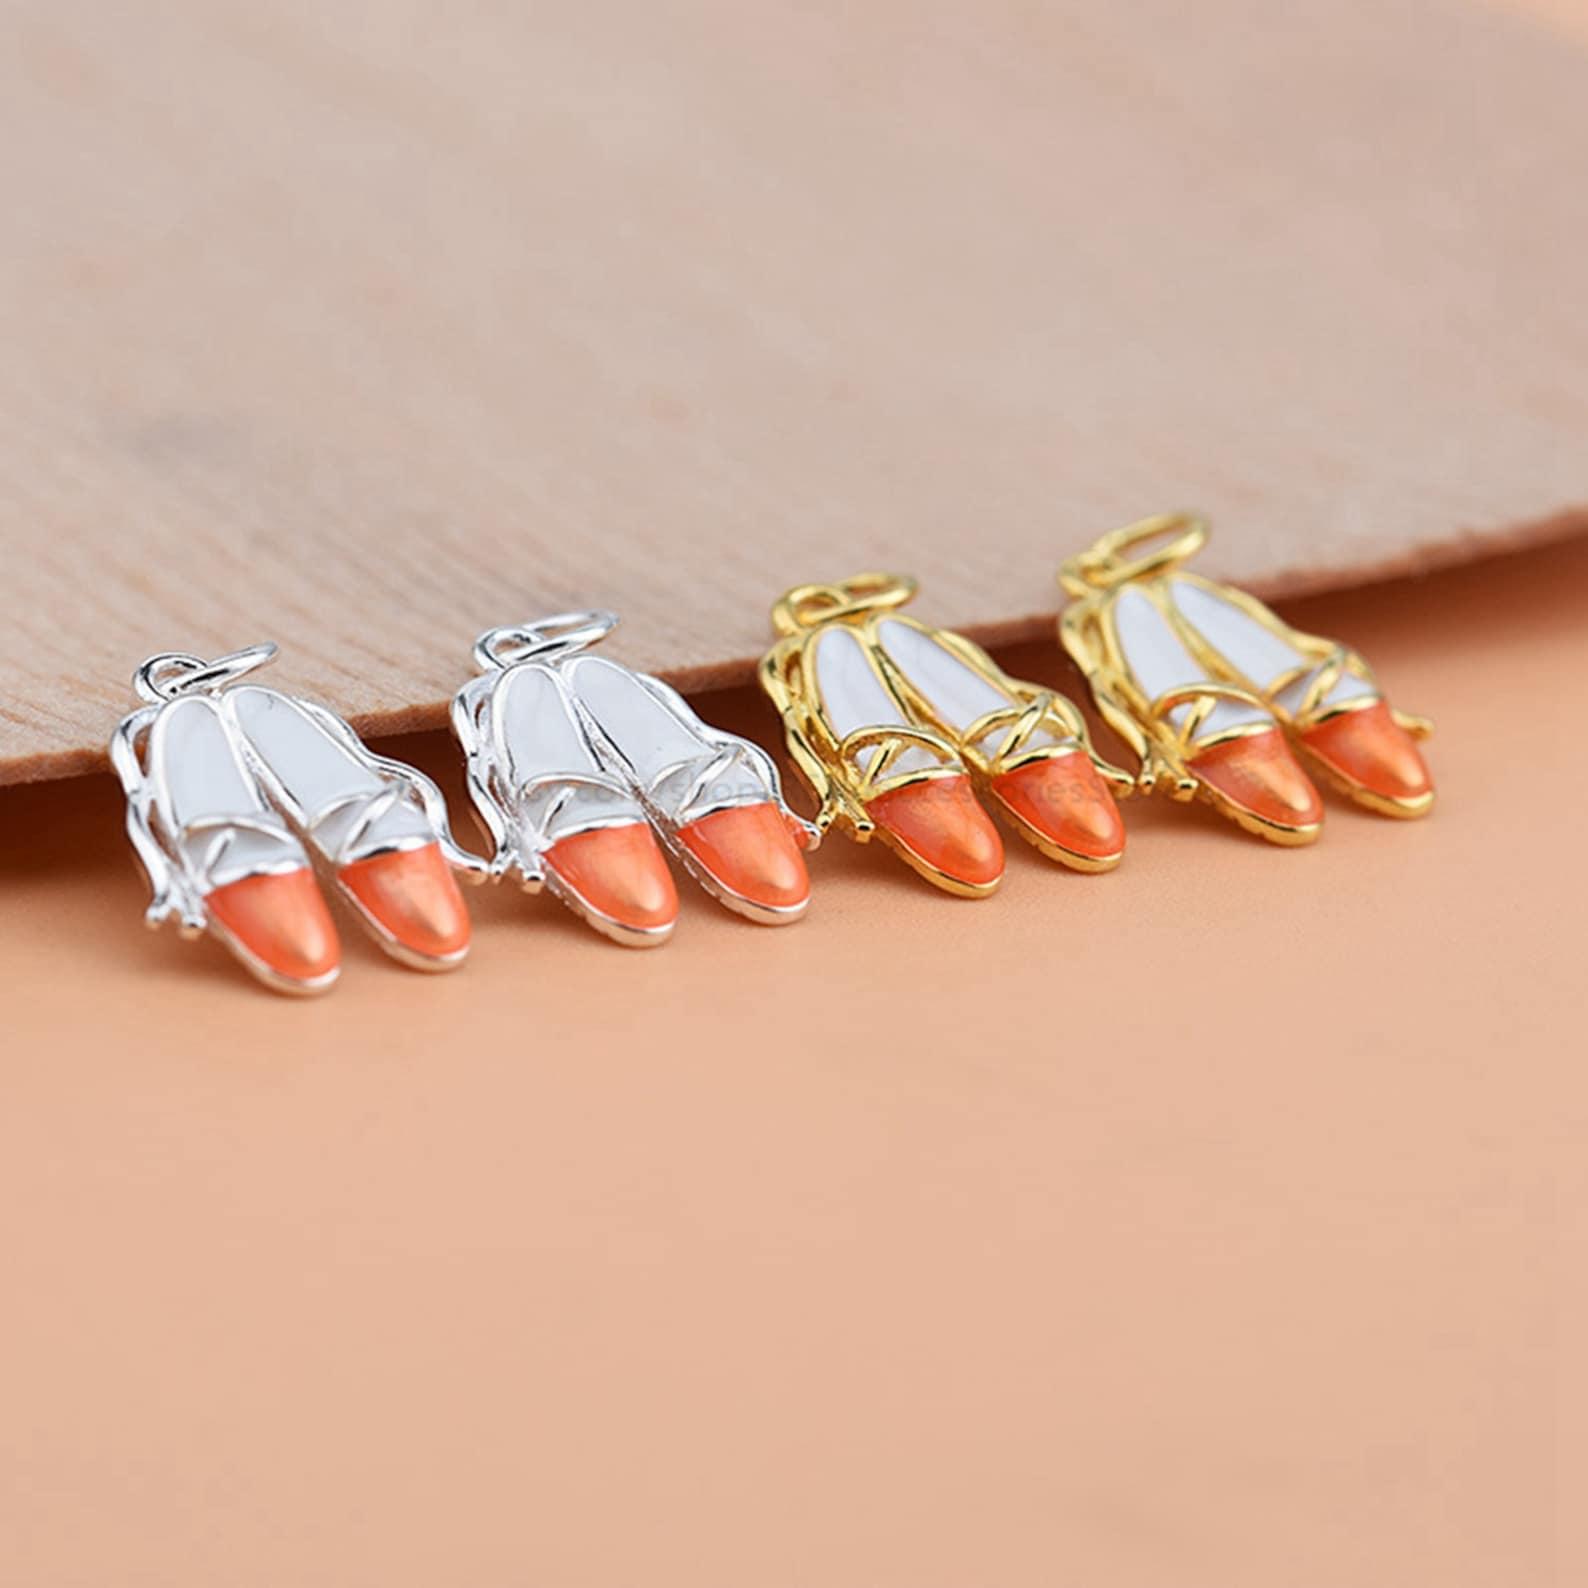 sterling silver dancing shoes charm, bracelet charm, necklace charm, 3d charm, small charm, ballet shoes charm pendant